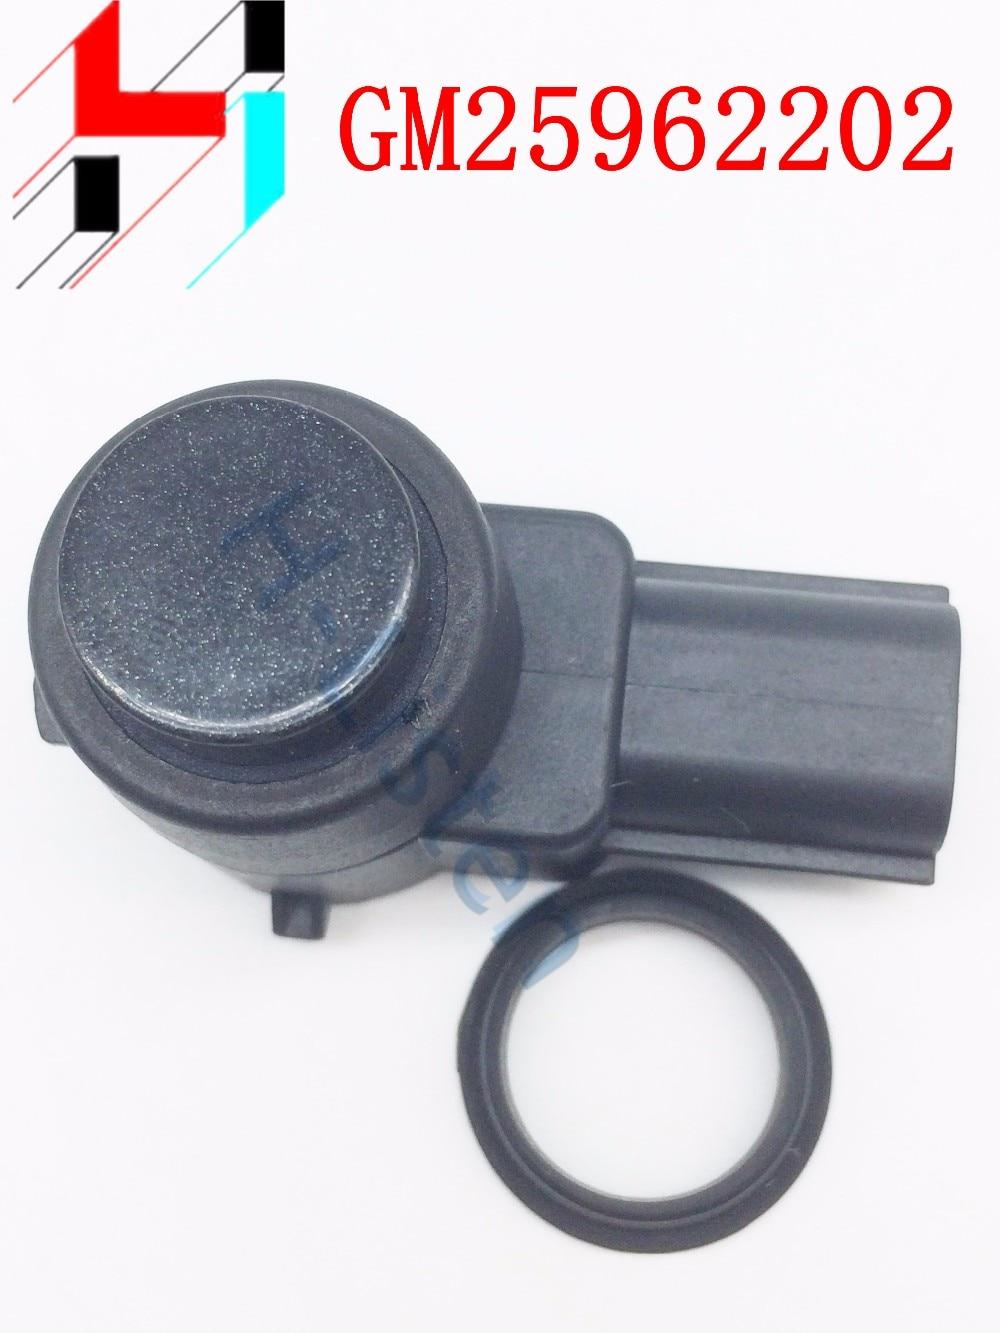 New REVERSE PARKING SENSOR PDC Fits Enclave Lucerne Savana Escalade 25962202 25962147,25961317,21995586,15239247,25961321 new set 4 9288230 pdc parking distance sensor reverse assist for bmw 0263013972